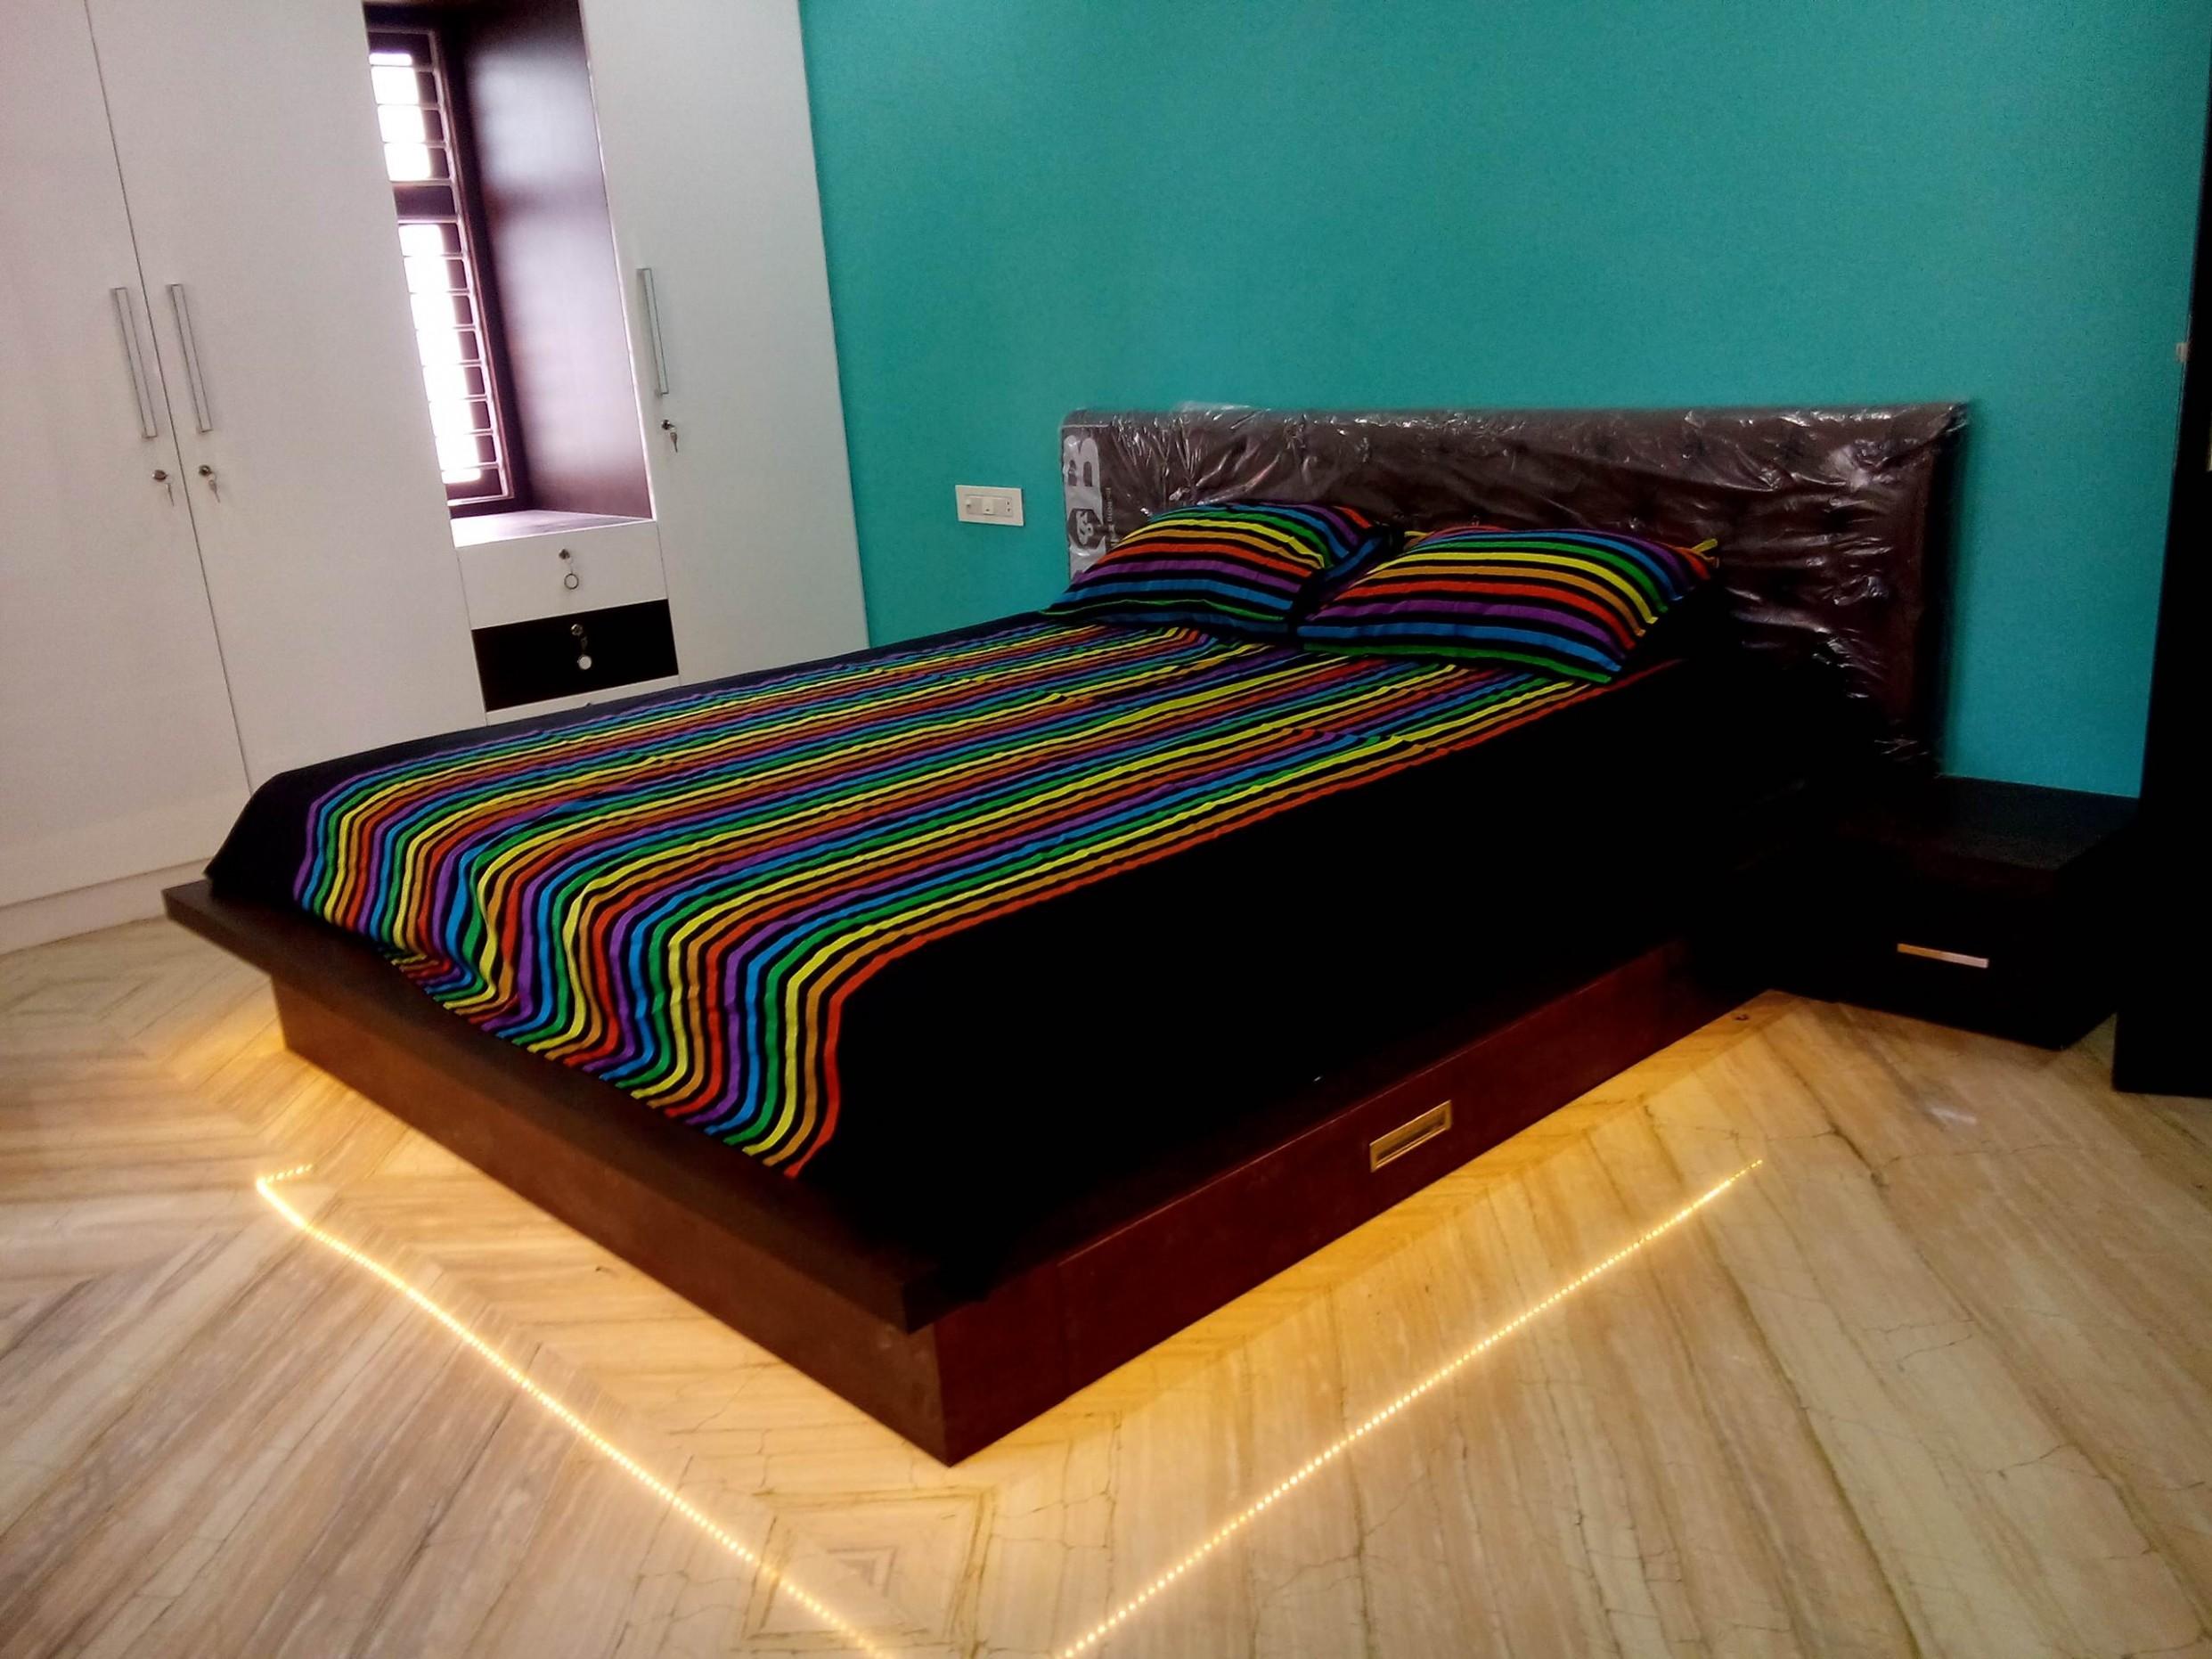 Interior Designing In Kerala Bedroom Ideas And Photos  Houzz - Bedroom Ideas Kerala